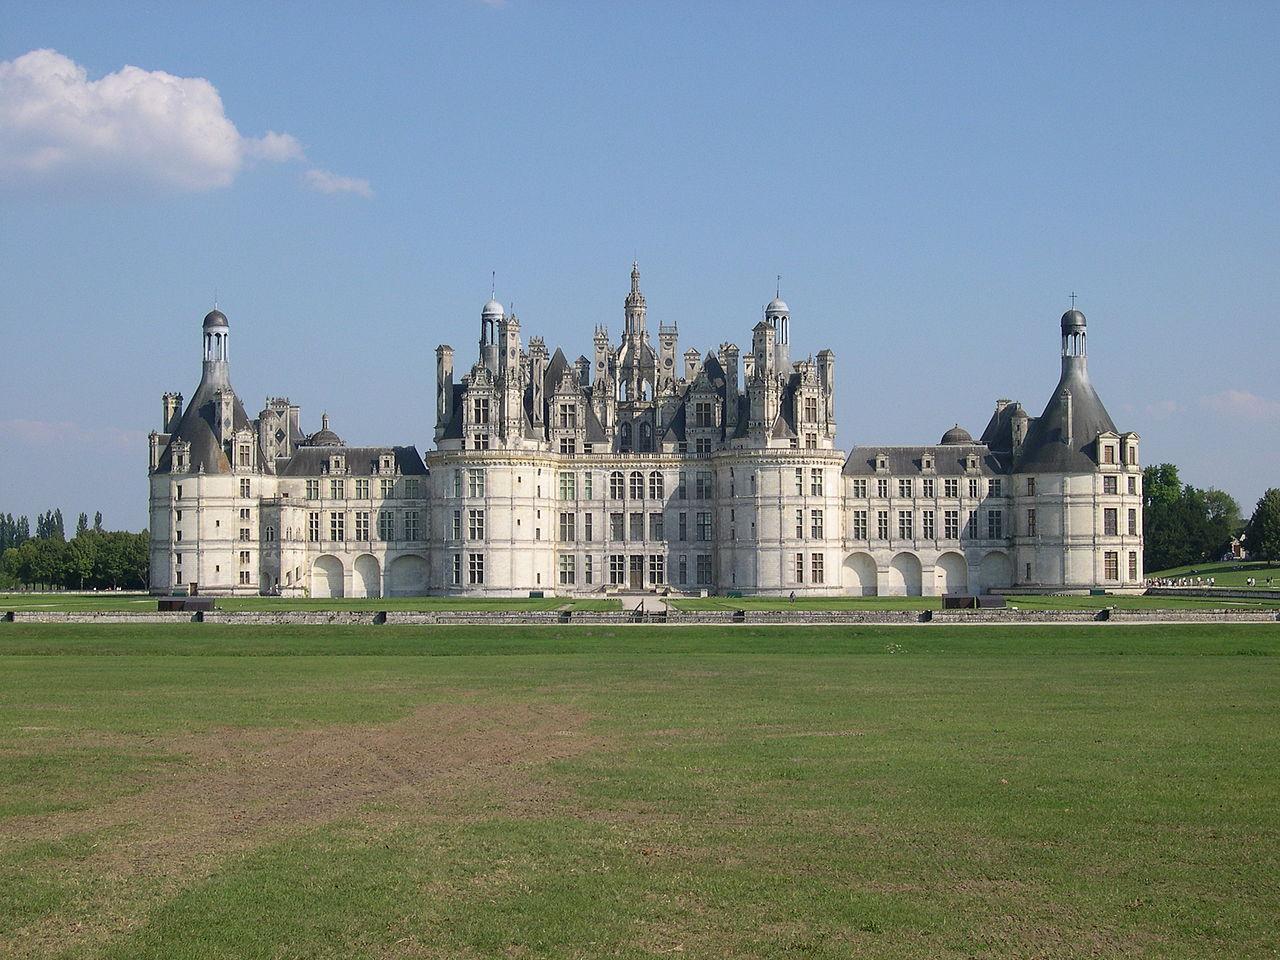 Vista del castillo de Chambord